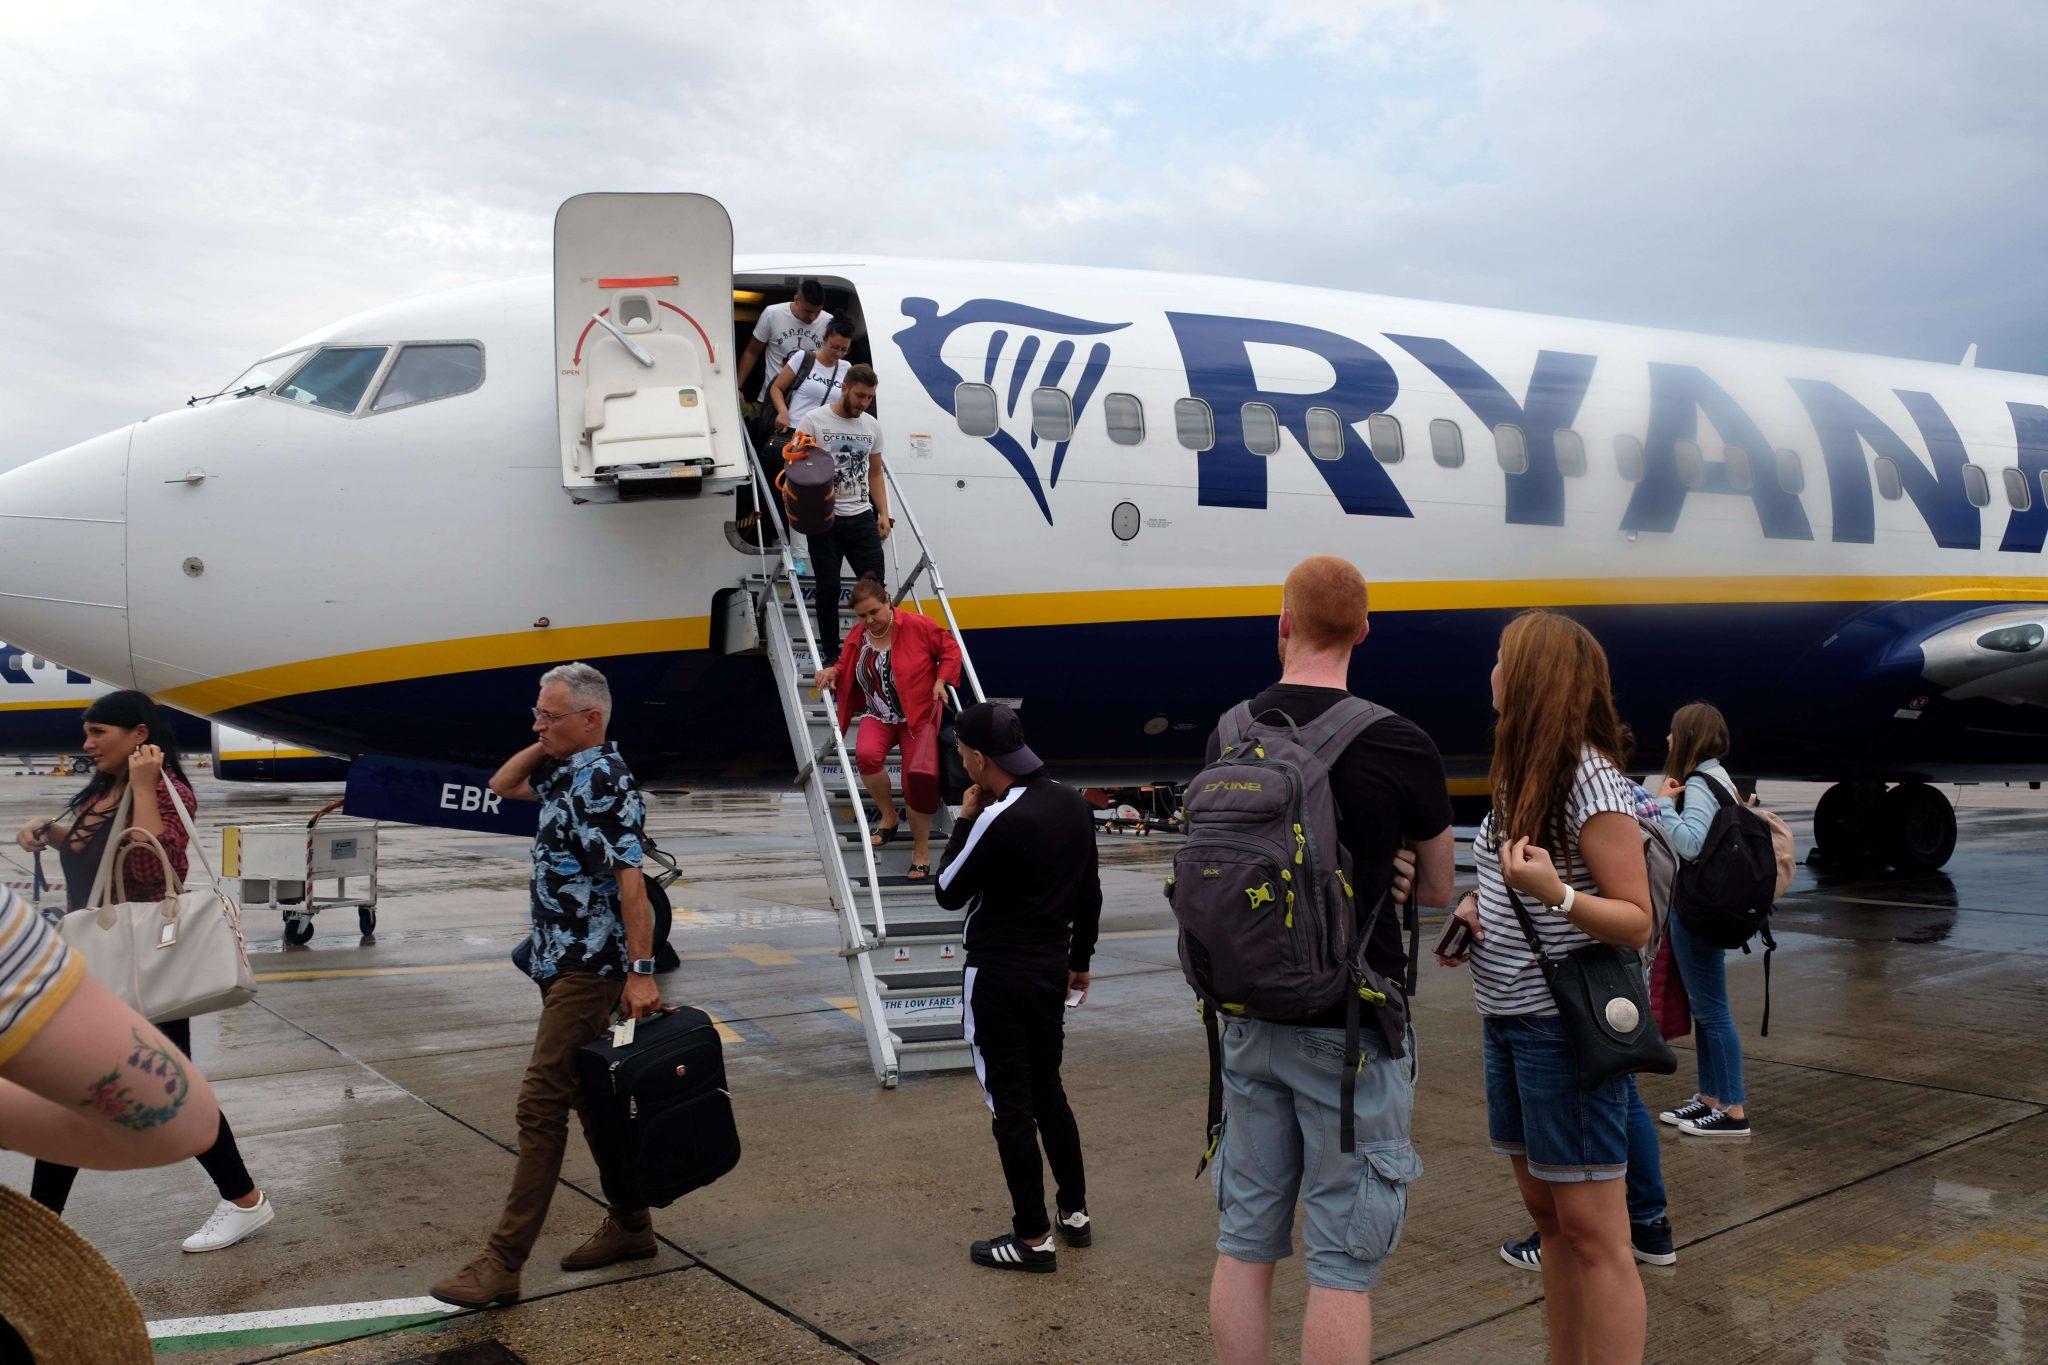 Ryanair bagage cabine payant